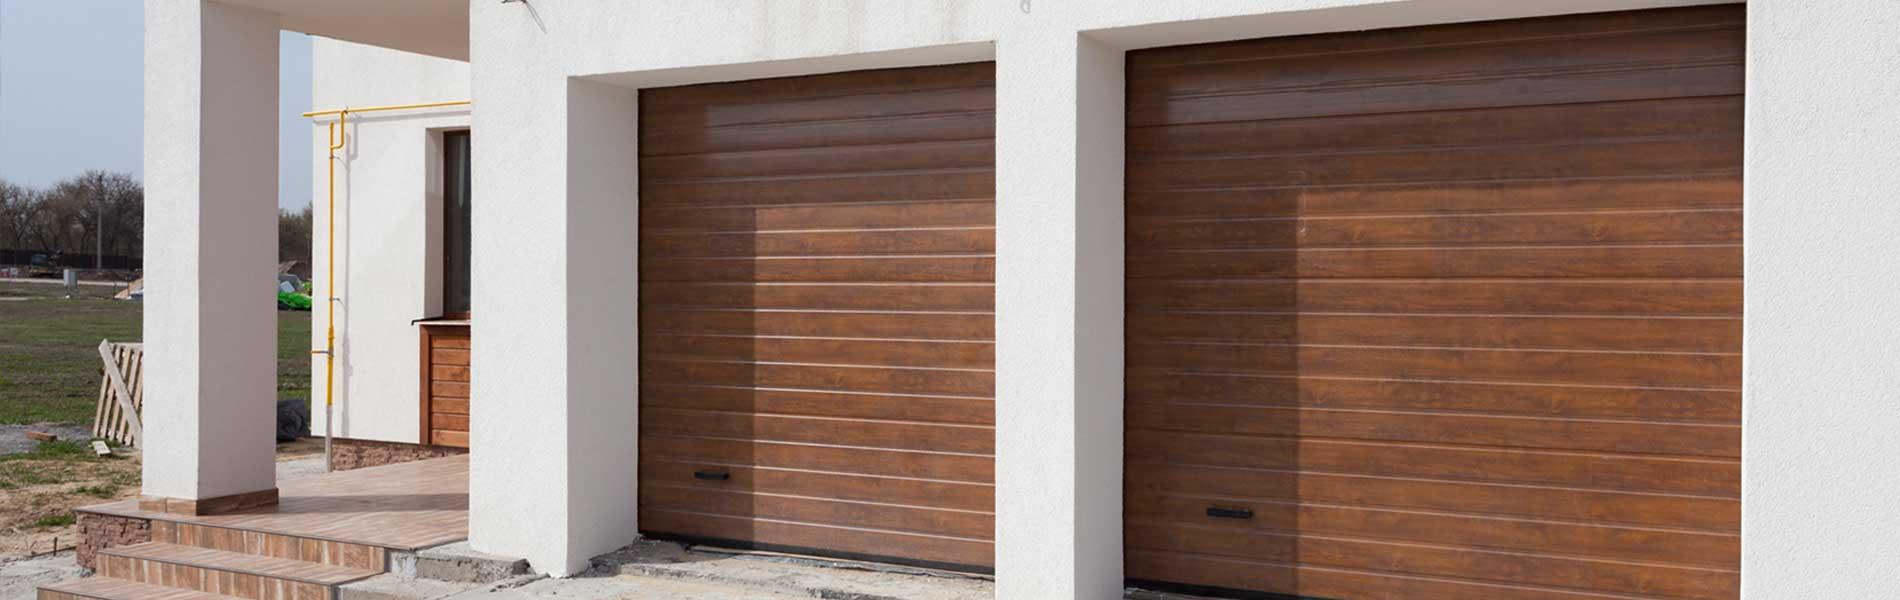 Elite Garage Door Service Garage Door Service Around Me Harrison